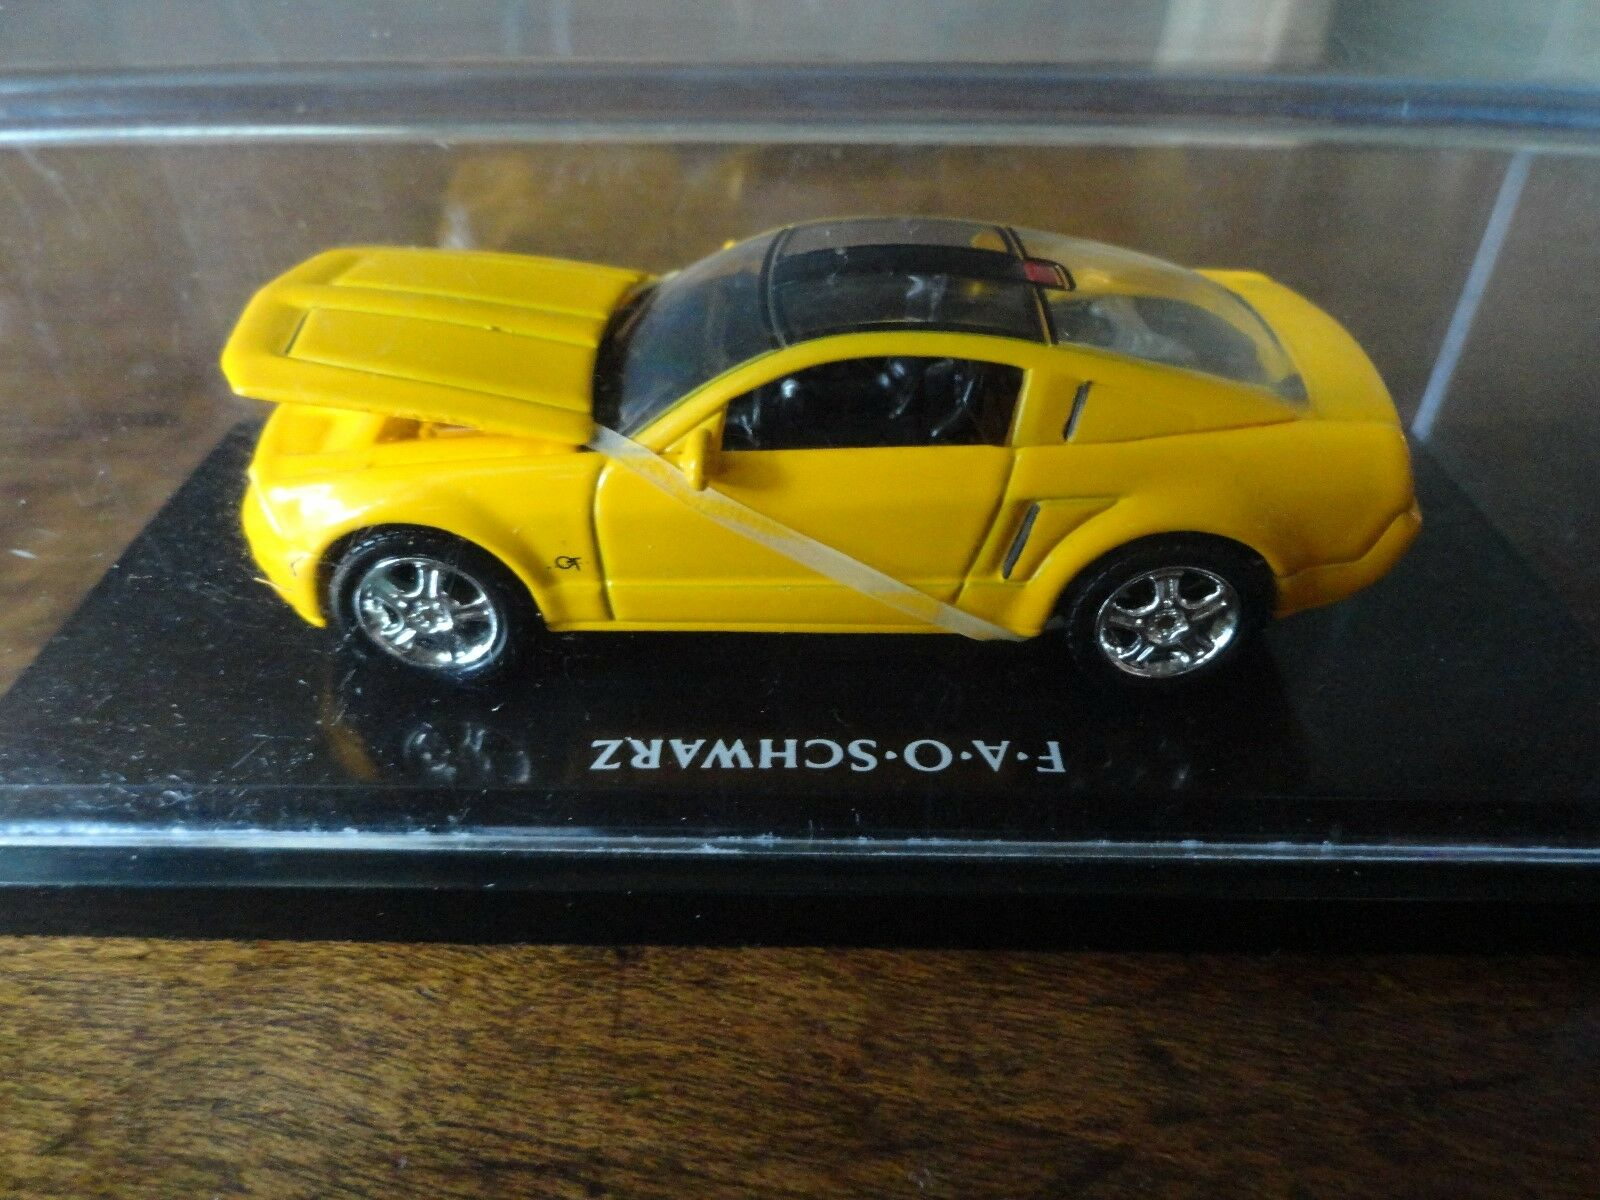 Gelbe mustang gt f-a-o-schwarz hot wheels druckguss auto im schaukasten